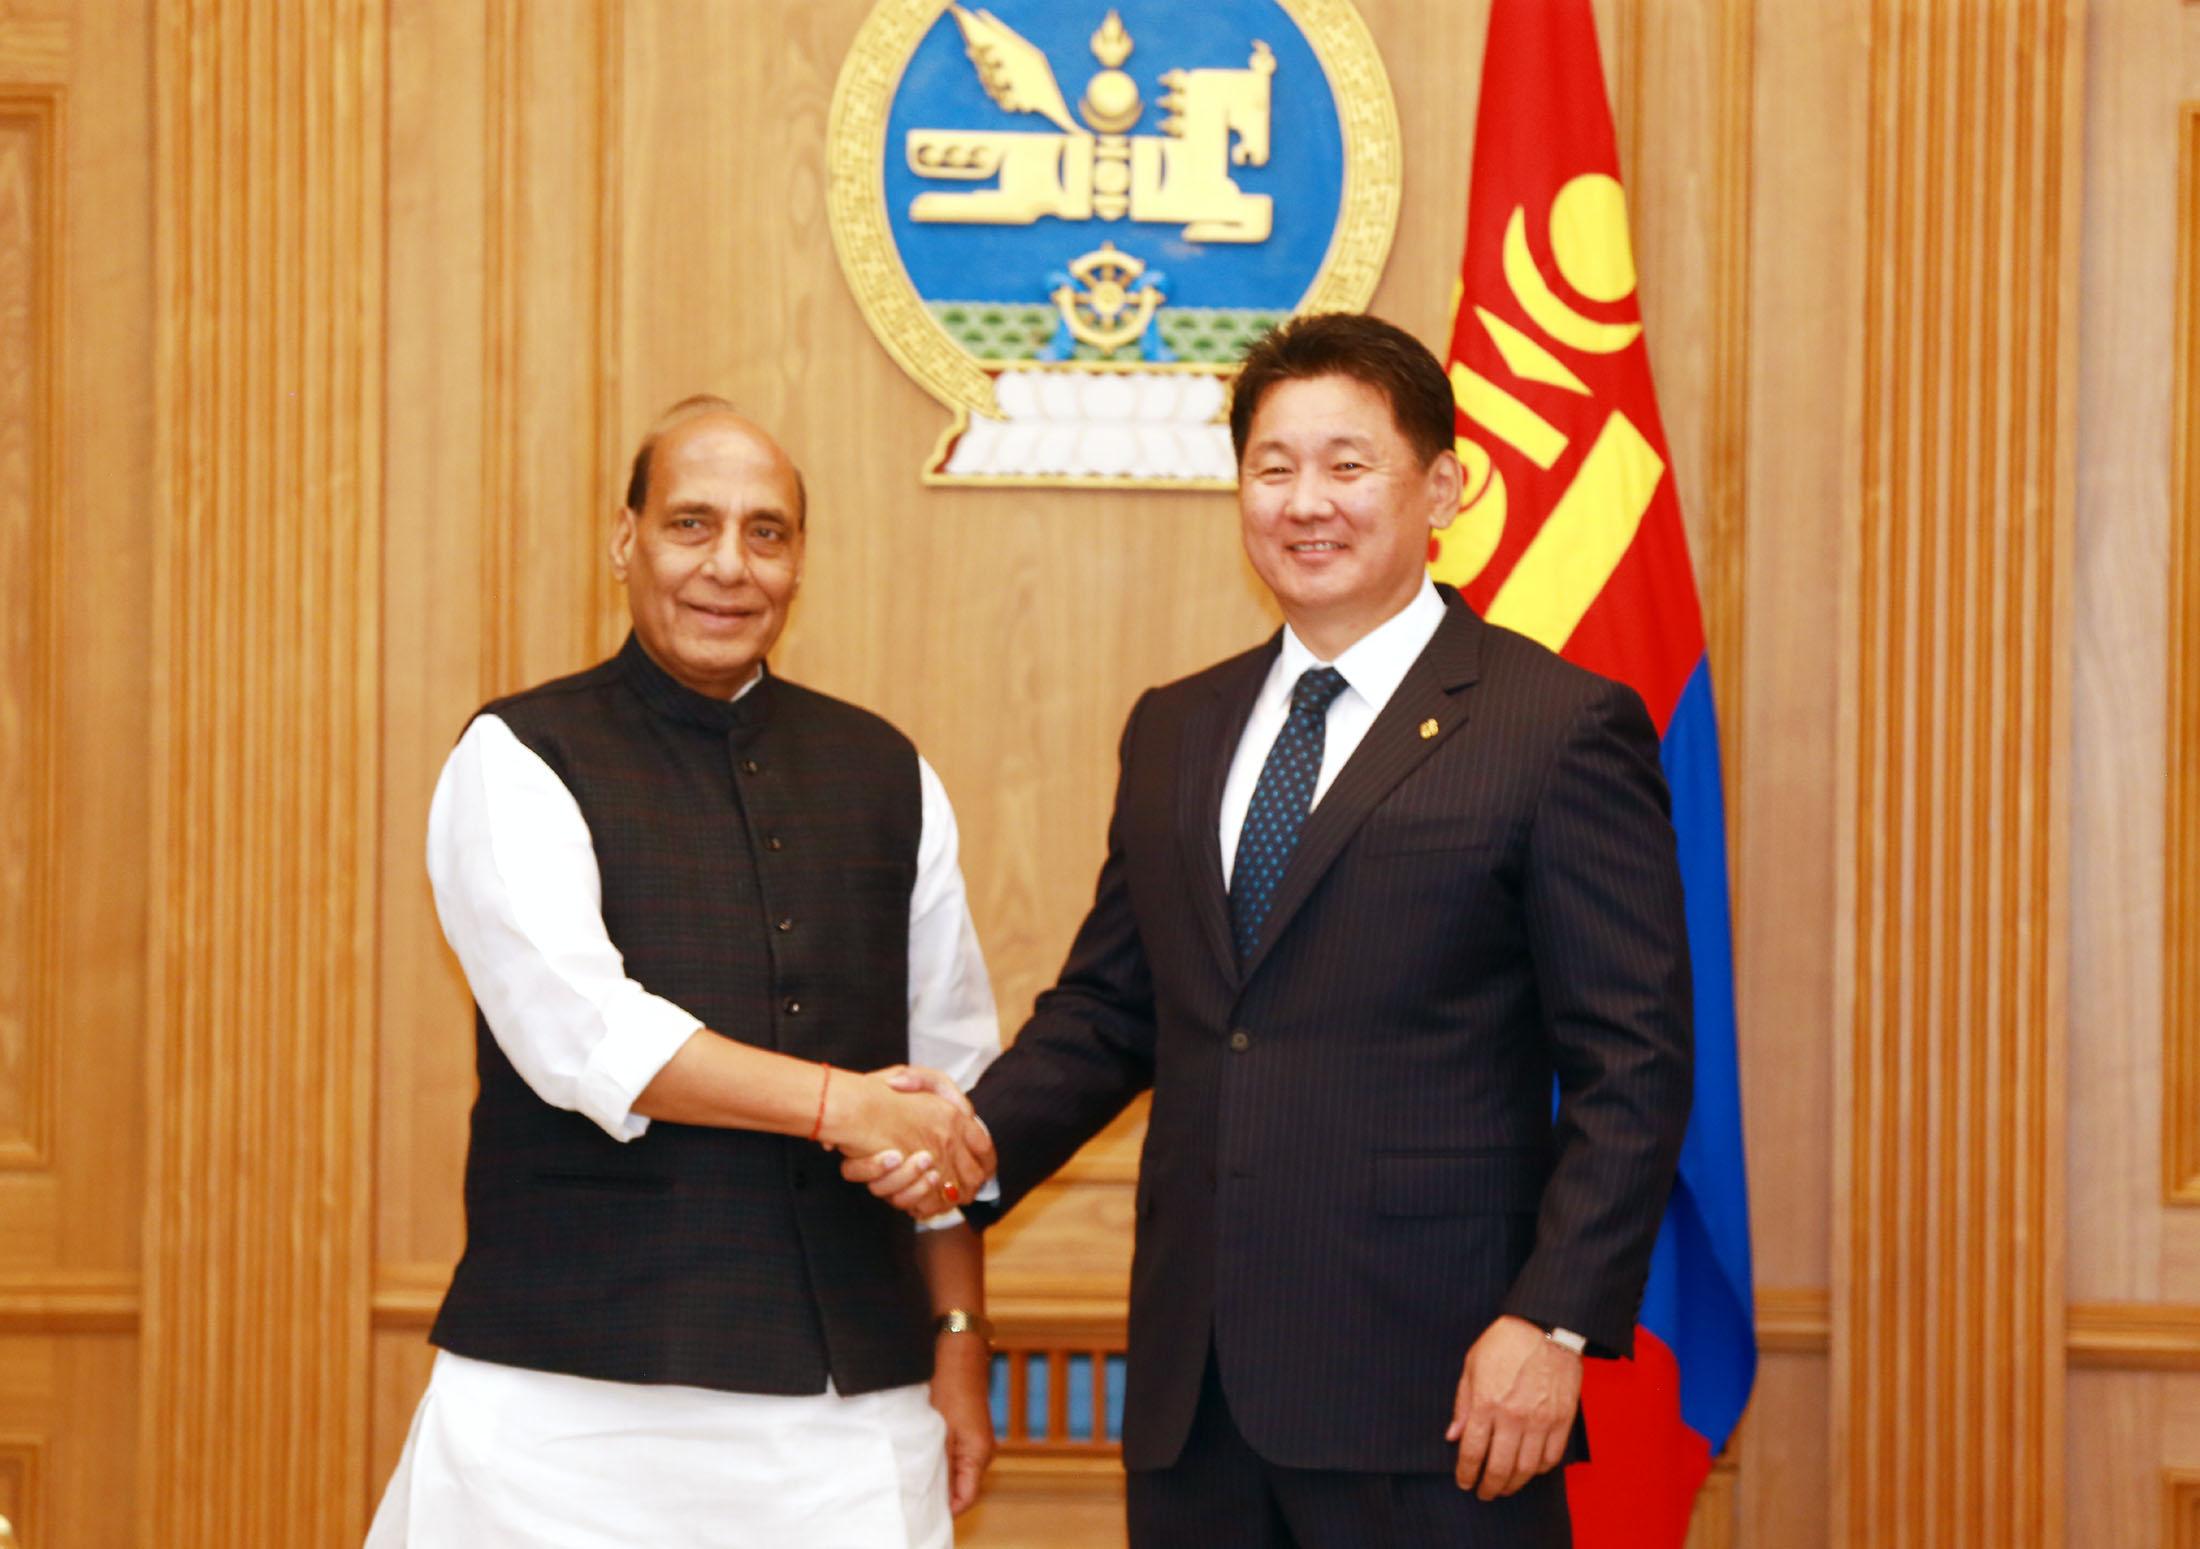 Shri Rajnath Singh with the Prime Minister of Mongolia, Mr. Ukhnaagin Khurelsukh before holding bilateral talks, in Ulaanbaatar on June 22, 2018.